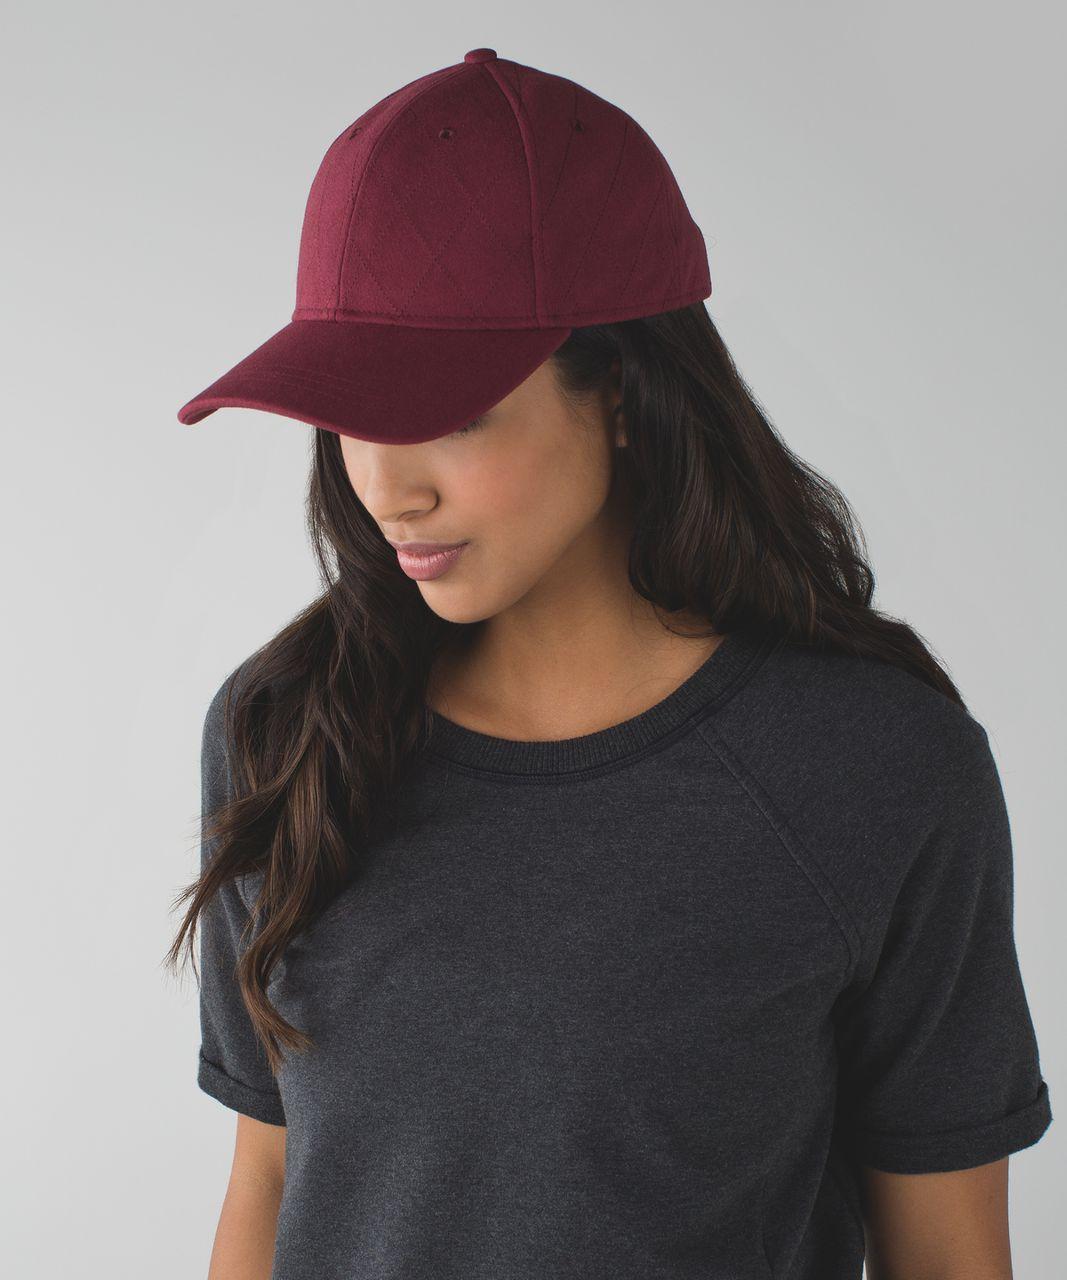 e2b5f5d7bad Lululemon Baller Hat (Felt) - Wine Berry - lulu fanatics